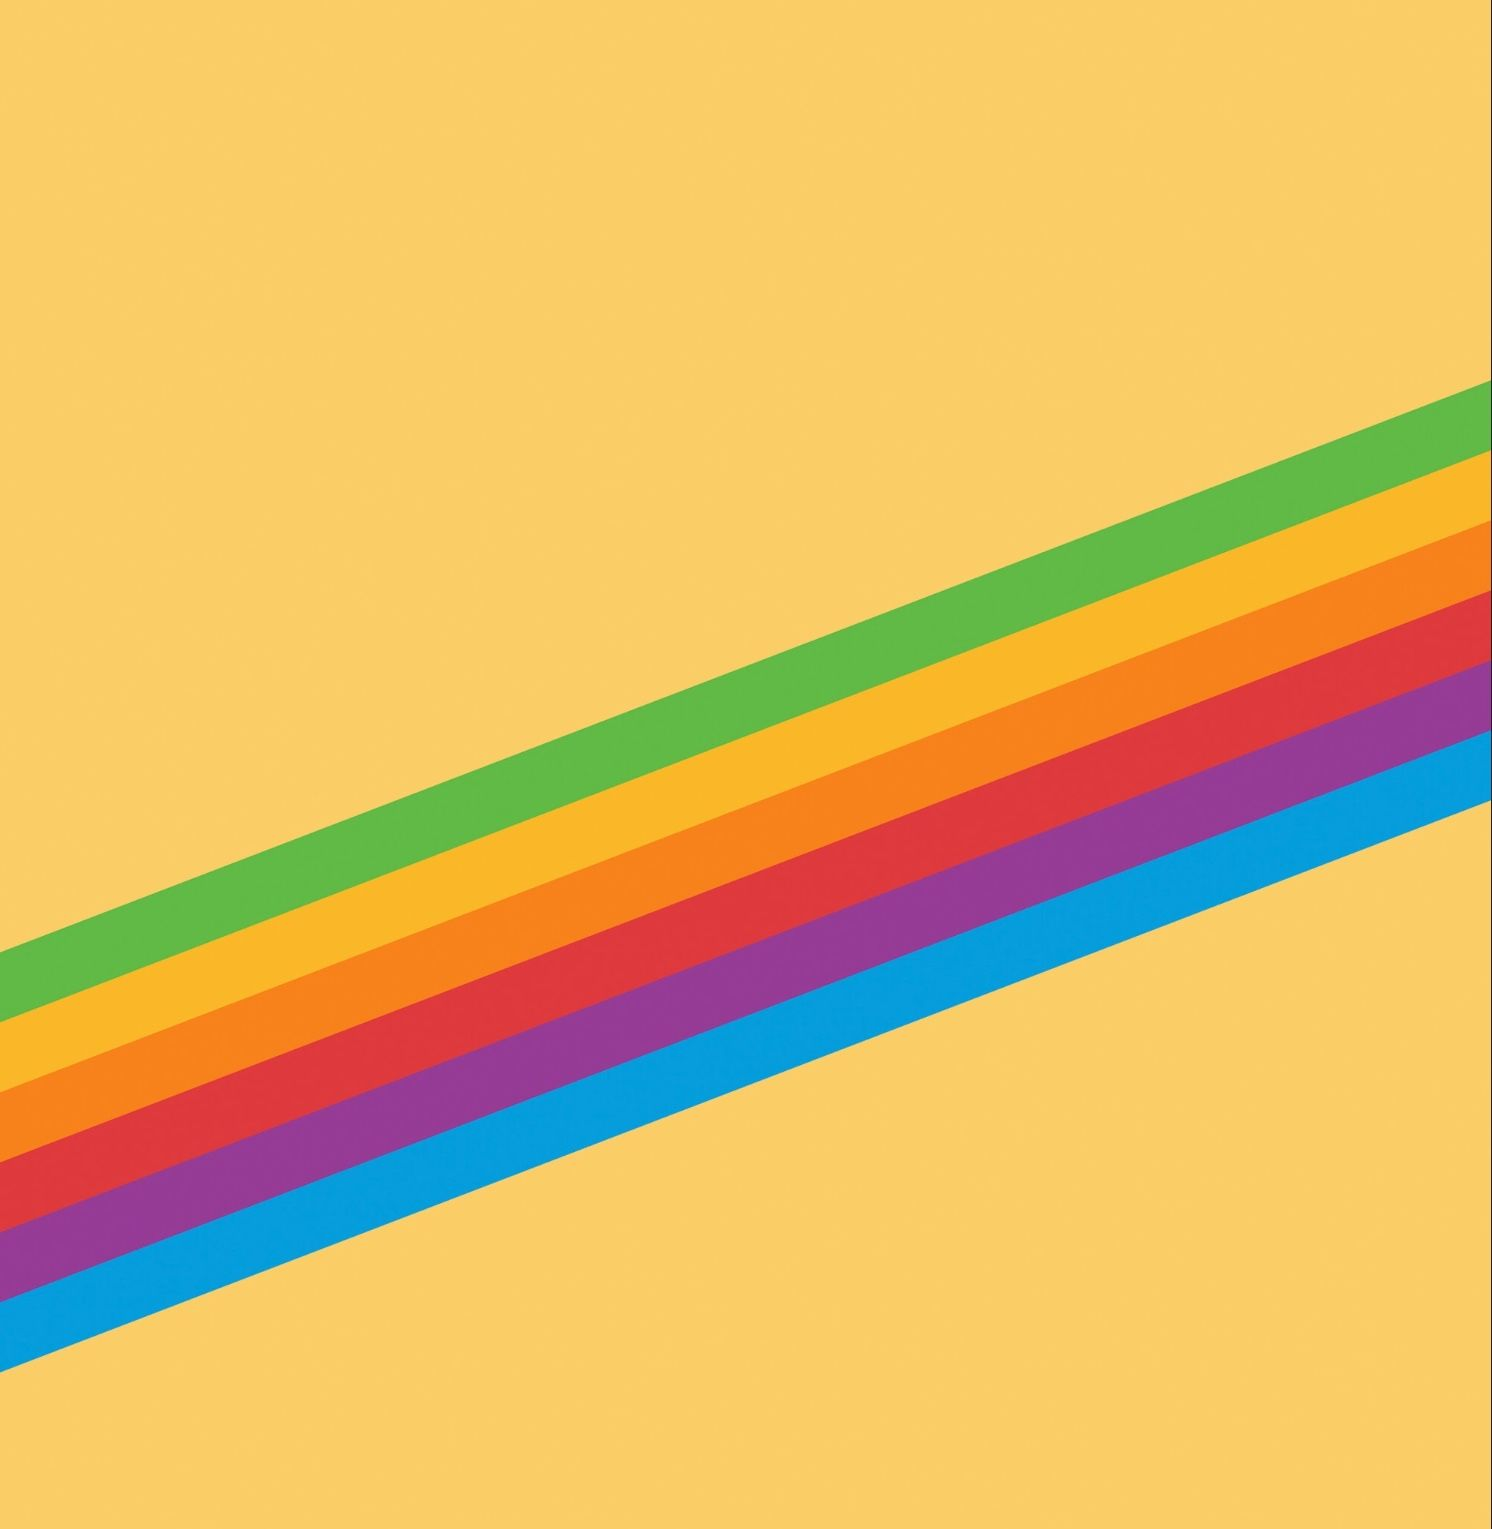 Yellow Rainbow Stripe Yellow Wallpaper Ios 11 Wallpaper Iphone Wallpaper